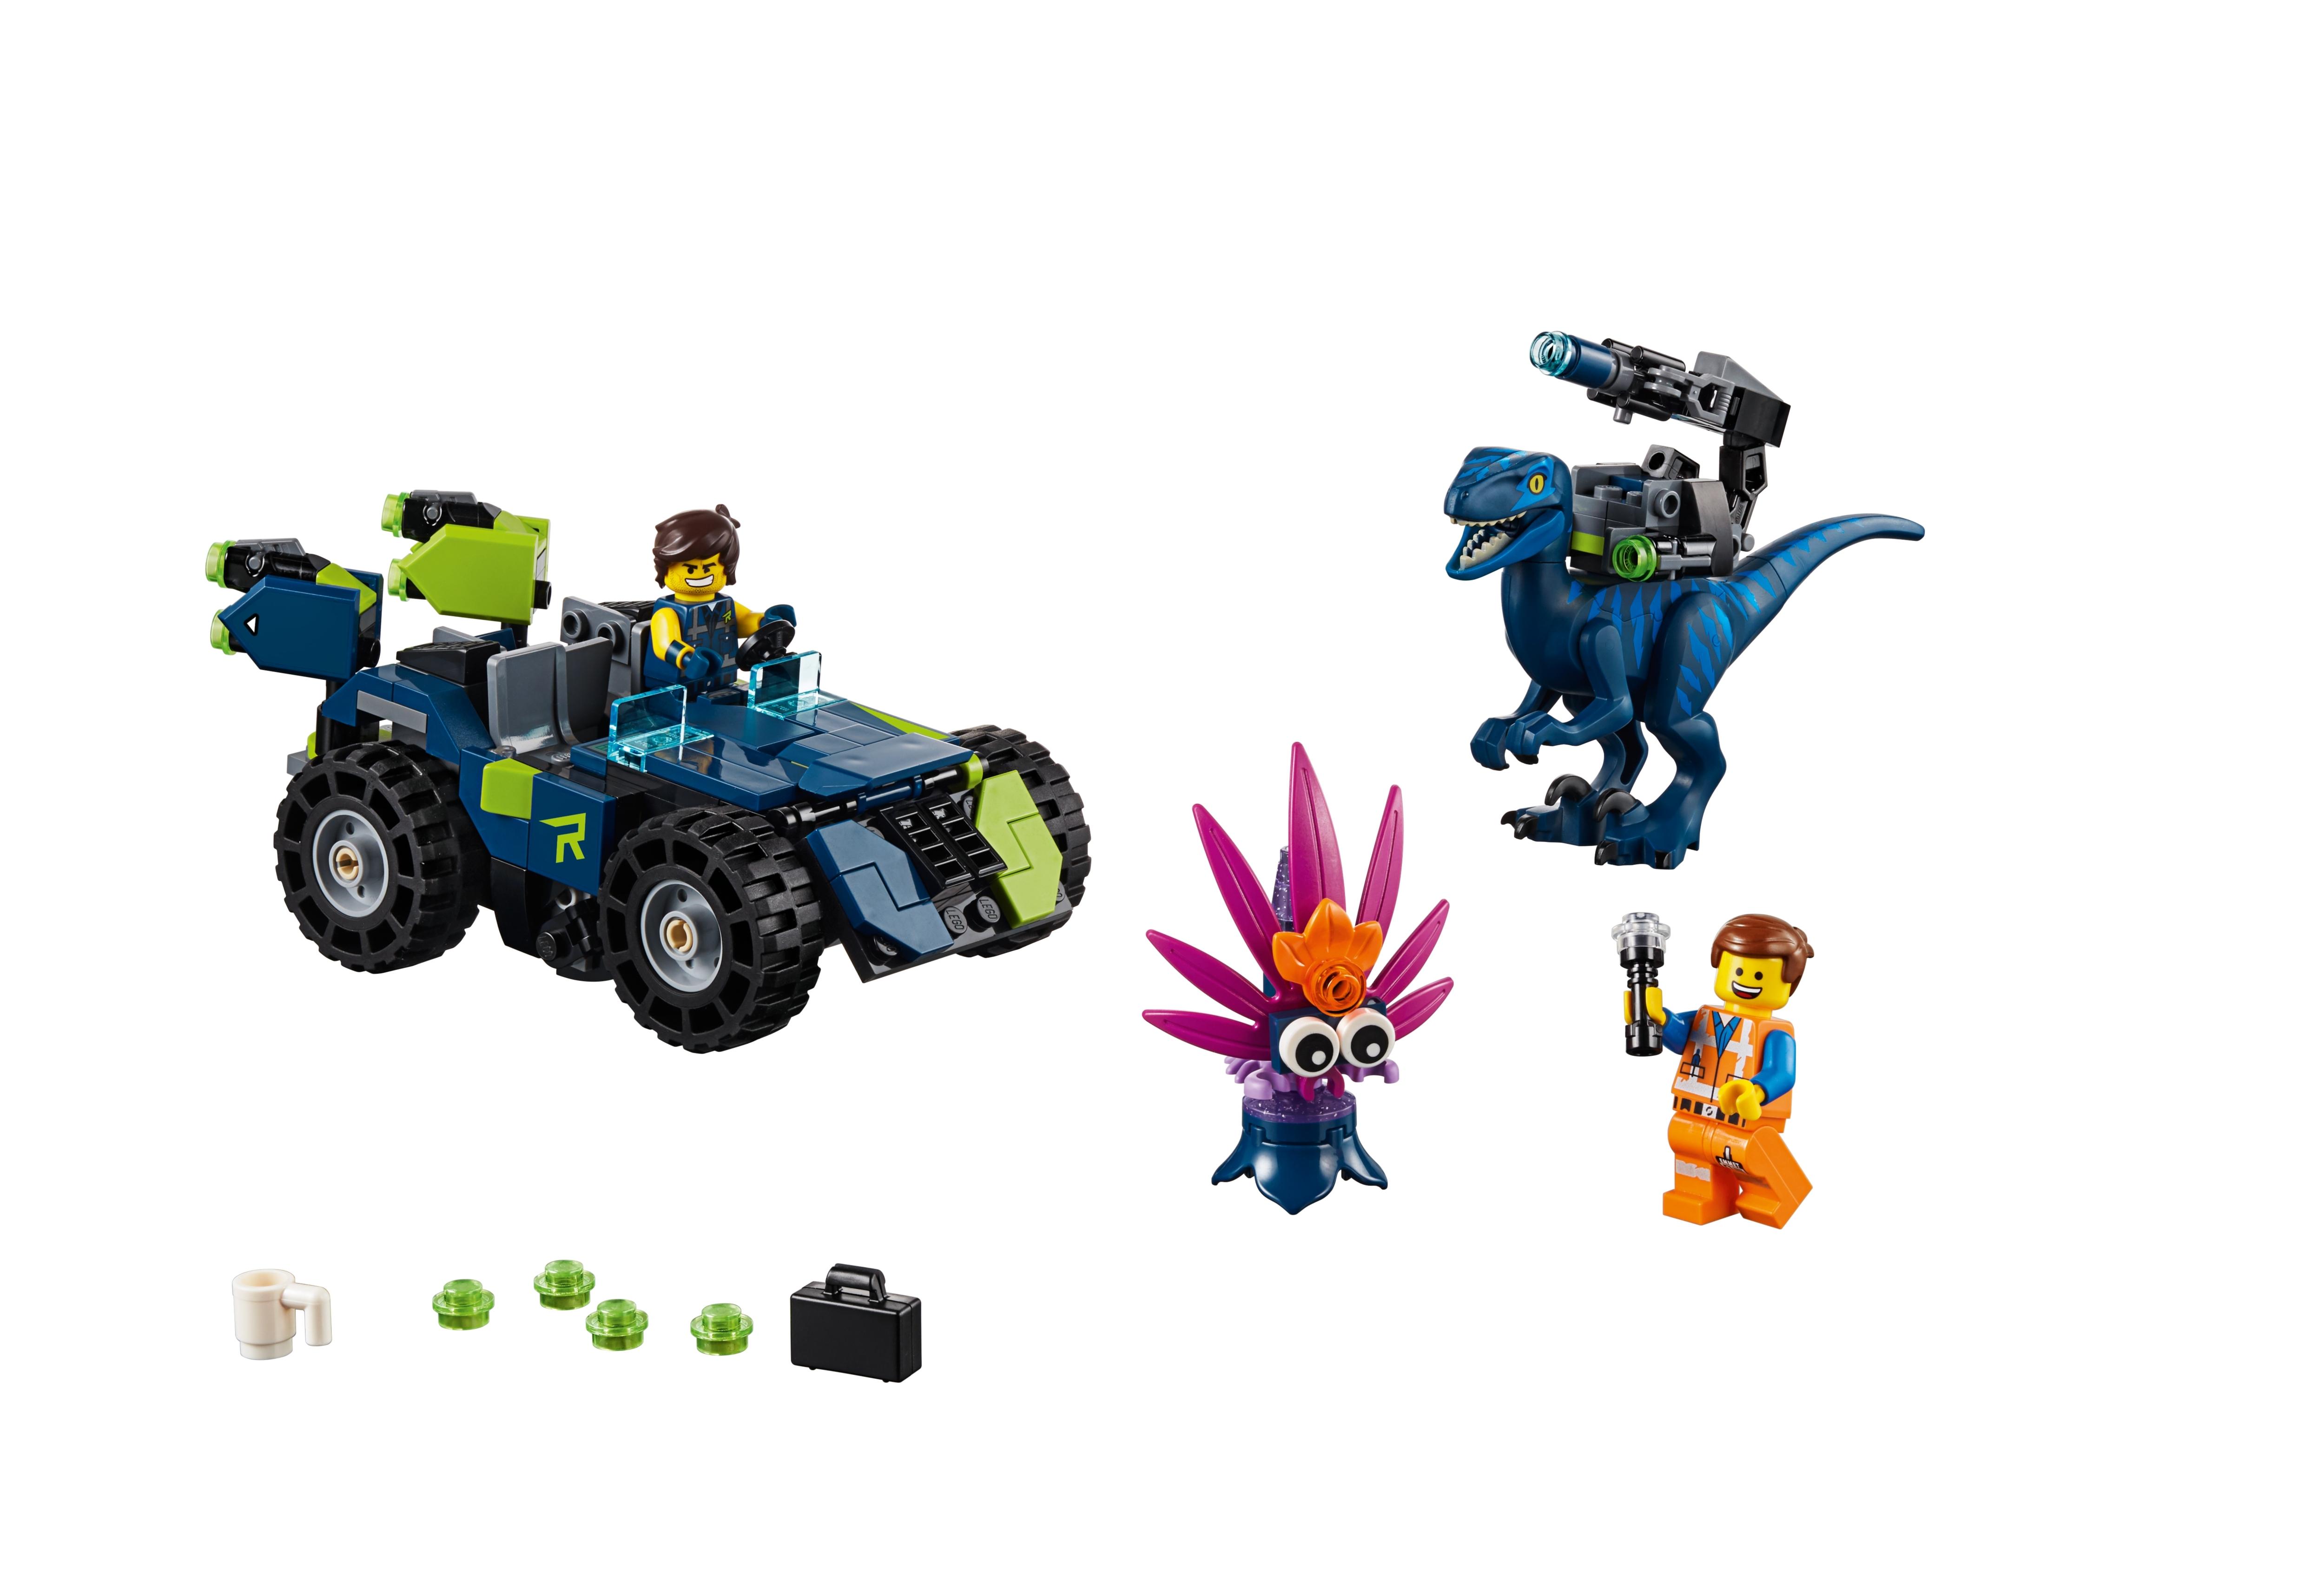 New Lego Emmet Minifigure LEGO Movie 2 from 70826 Minifig